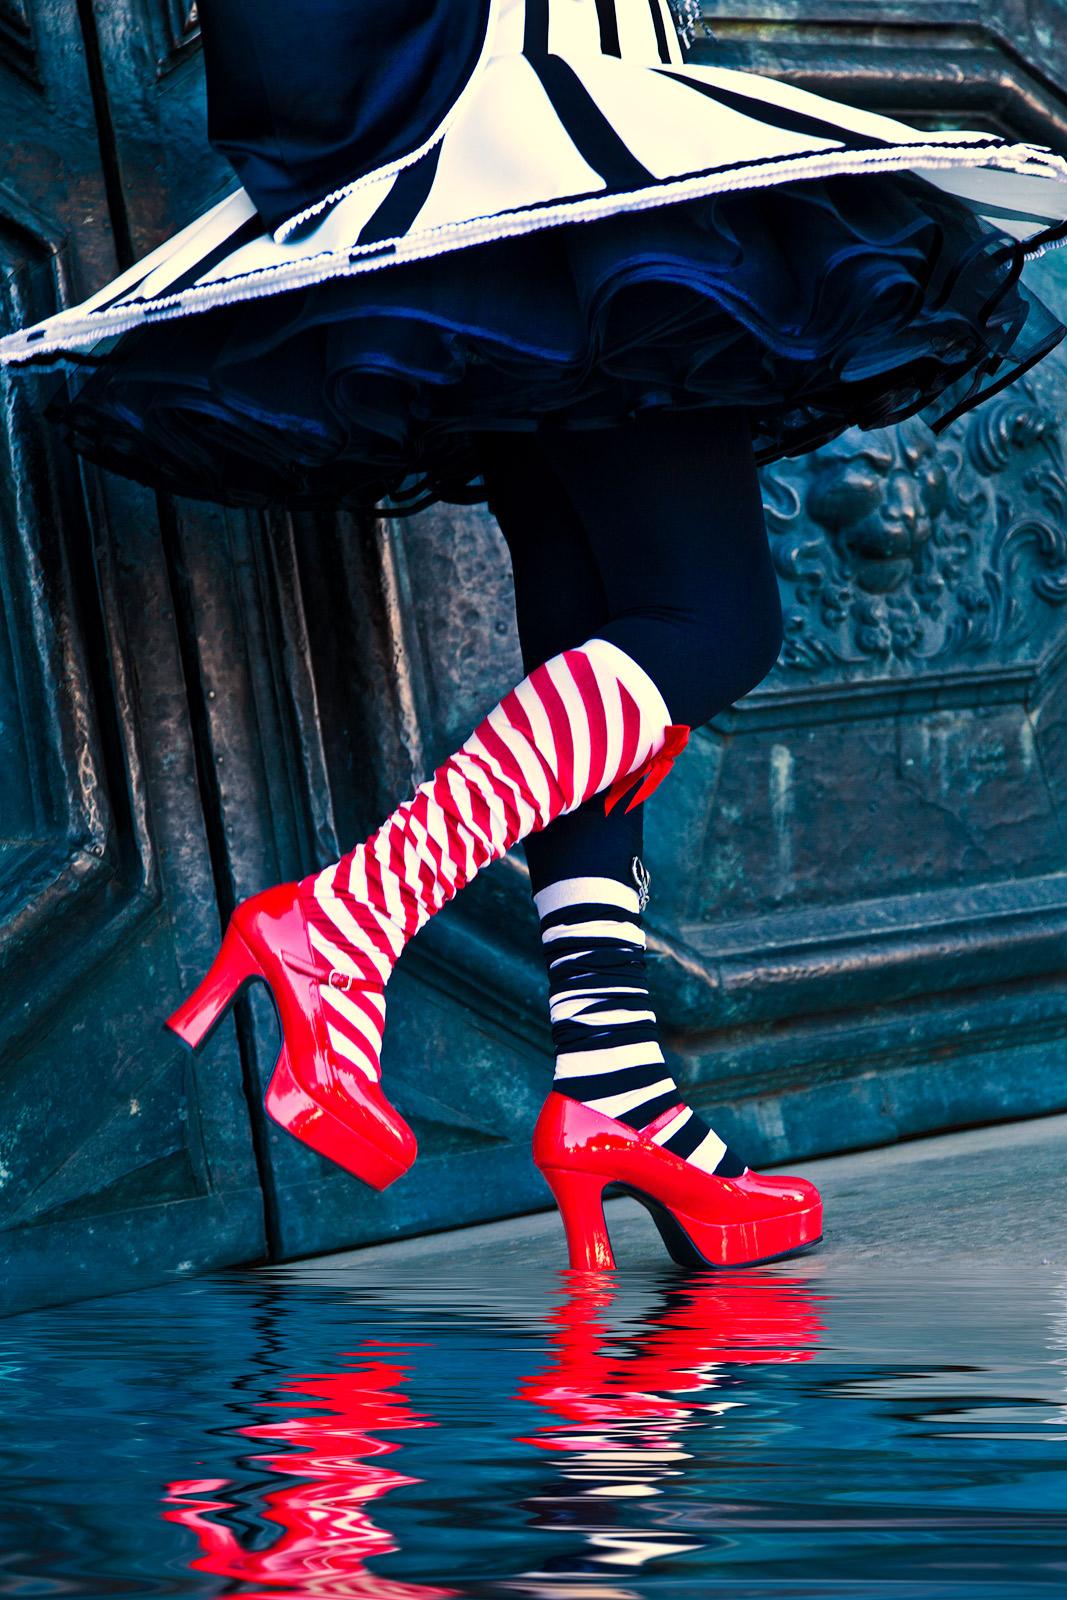 carnival, celebration, colorful, costume, daniela, daniela schmid, europe, italy, mask, party, san gorgio, shoe, venice, vertical, photo